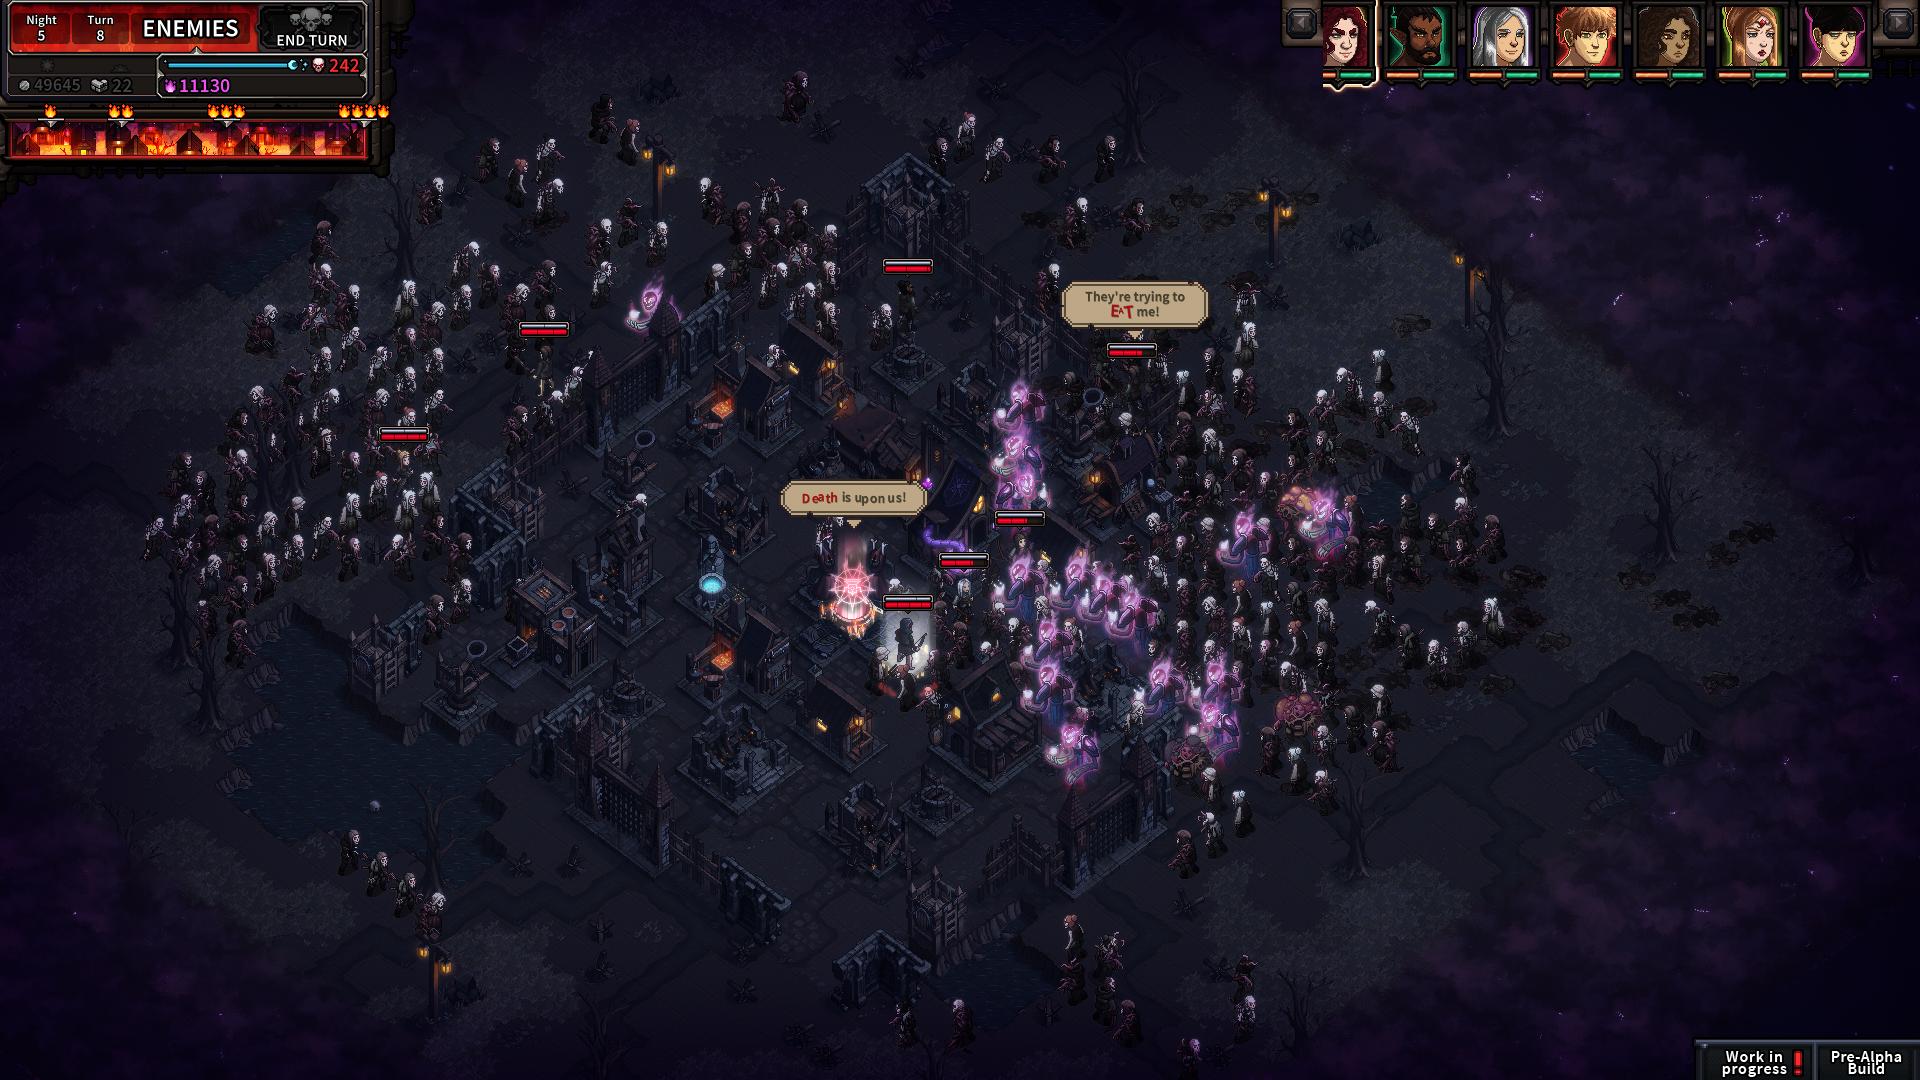 The Last Spell - Hordes of monsters